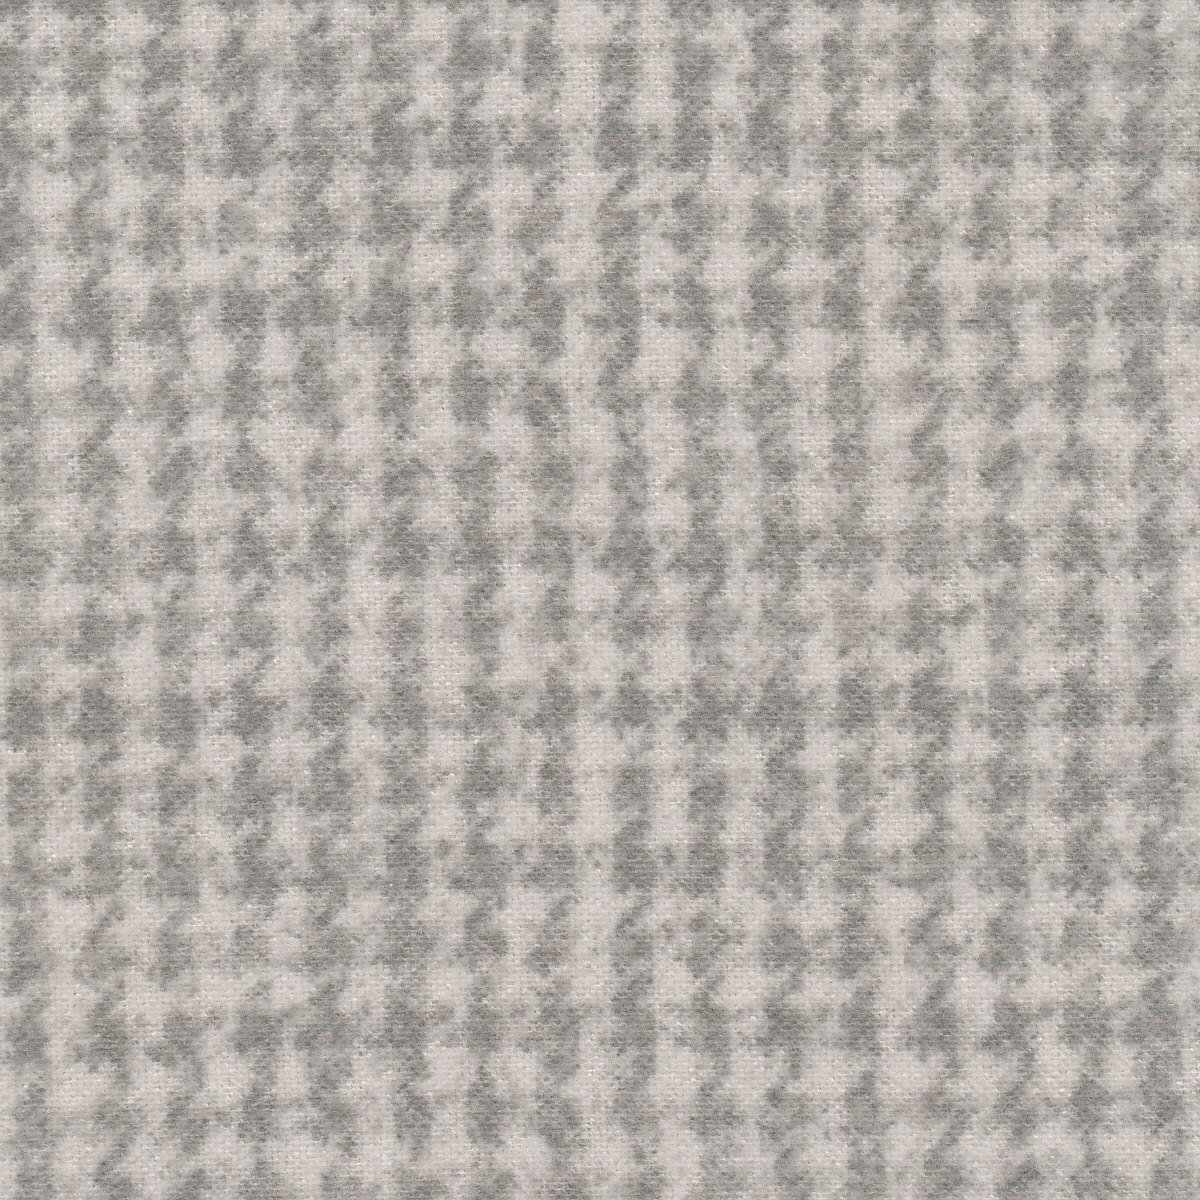 Woolies Flannel - MASF18503-K